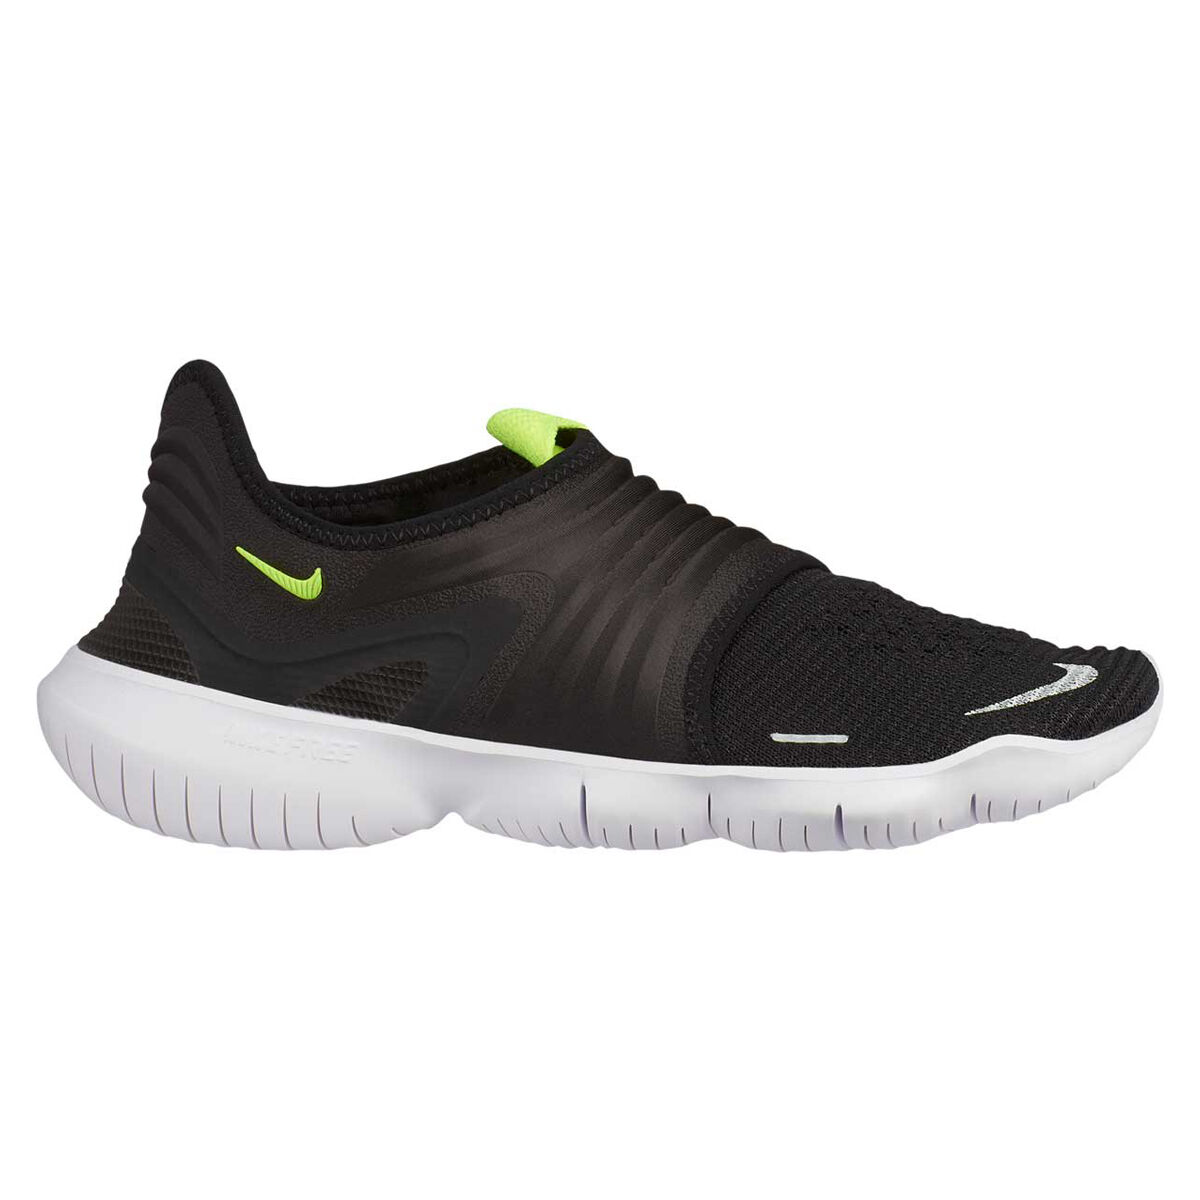 Nike Free RN Flyknit 3.0 Womens Running